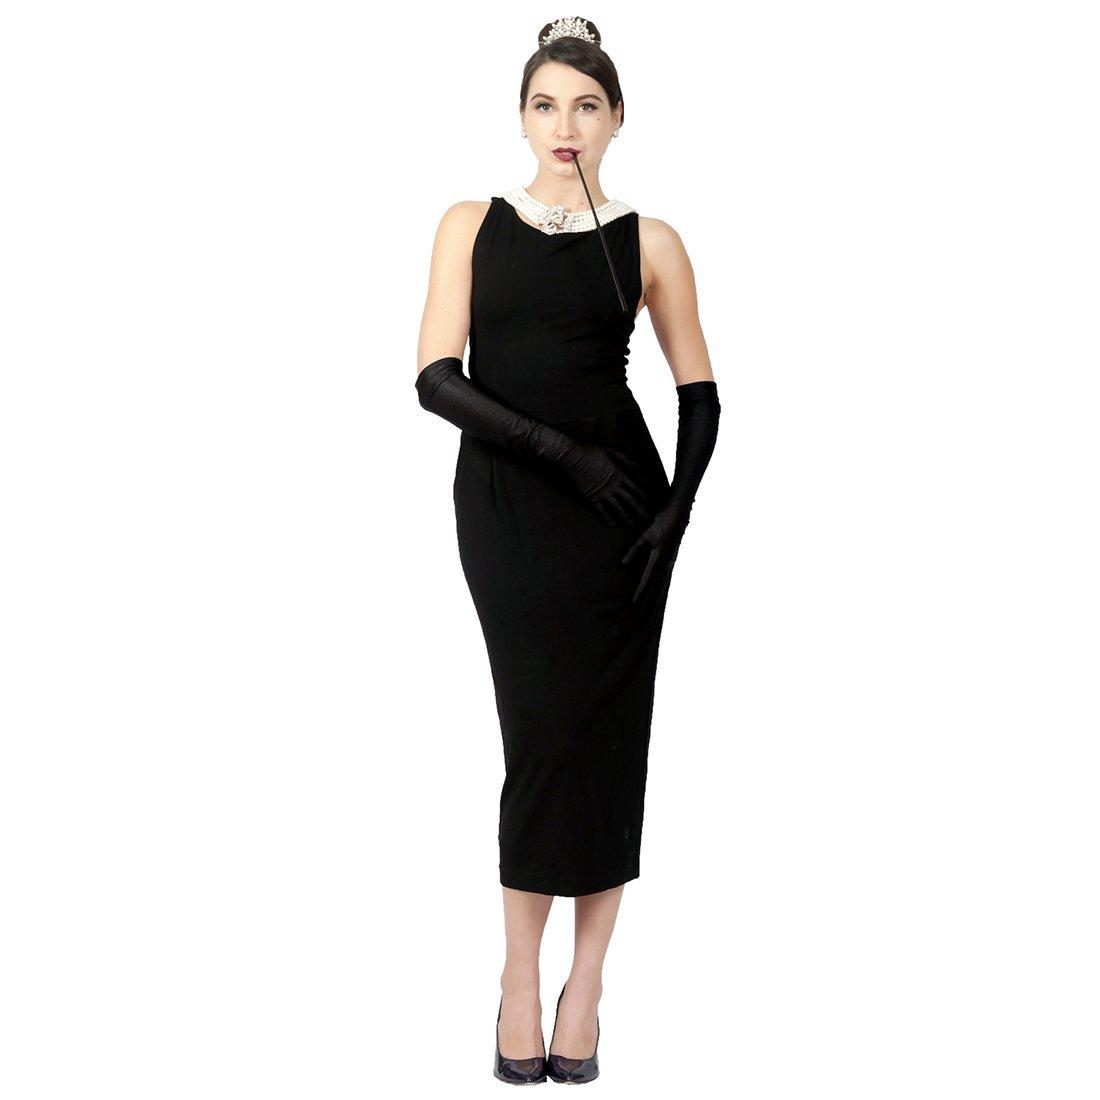 Original Audrey Hepburn ''Breakfast at Tiffany's'' Complete Costume Set - Cotton Version (XS) w/Gift Box